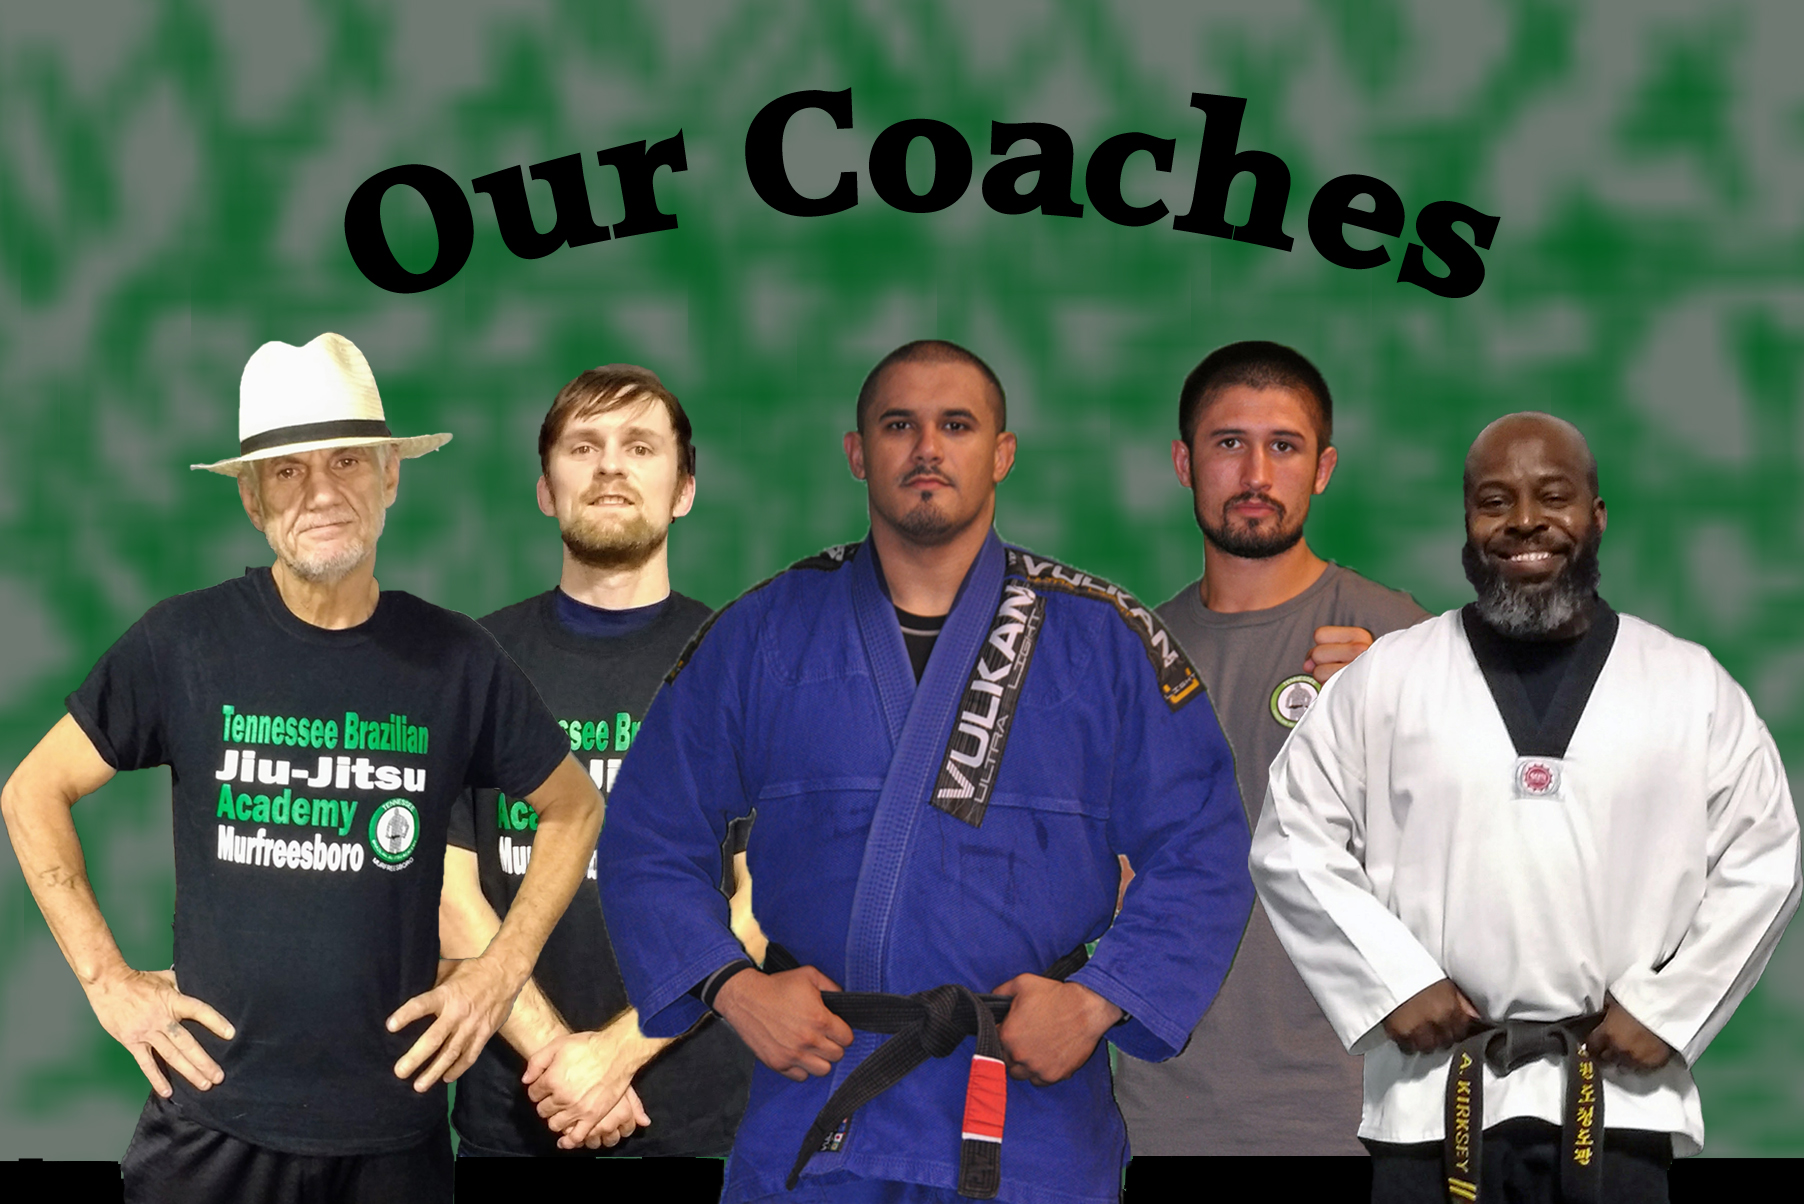 Coaches Group Pic Sep JPEG copy.jpg